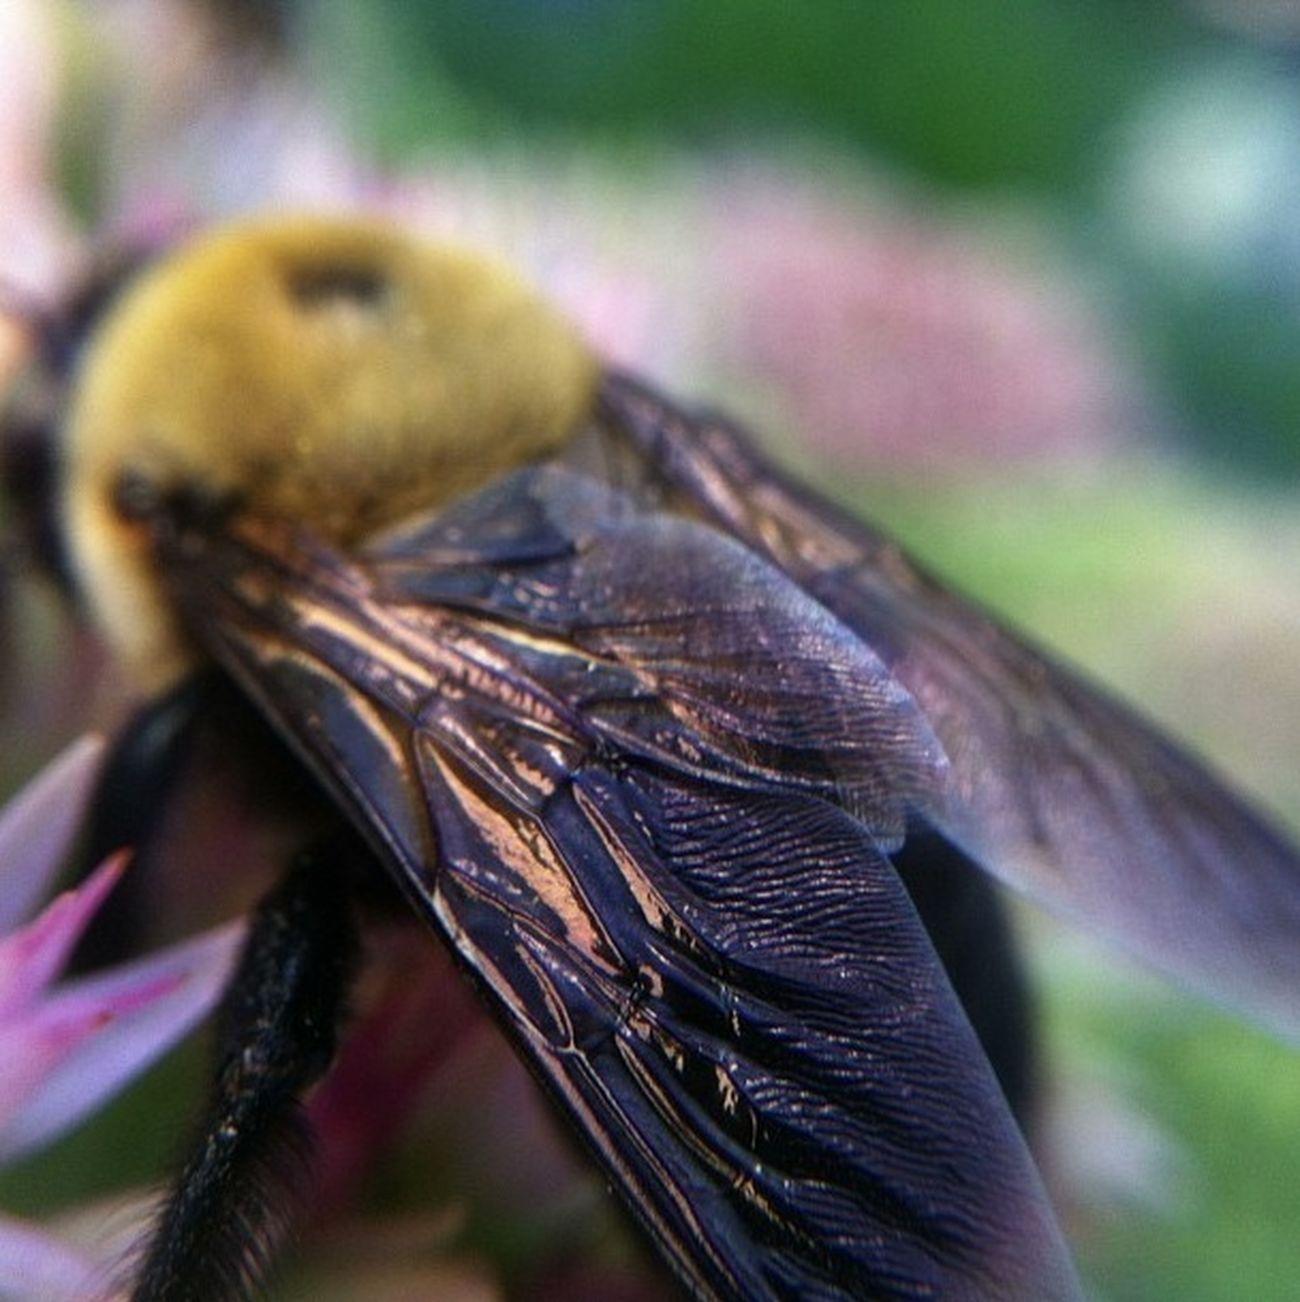 Macro Photography Bee_love Macro_bugs The Often Overlooked Beauties In Life